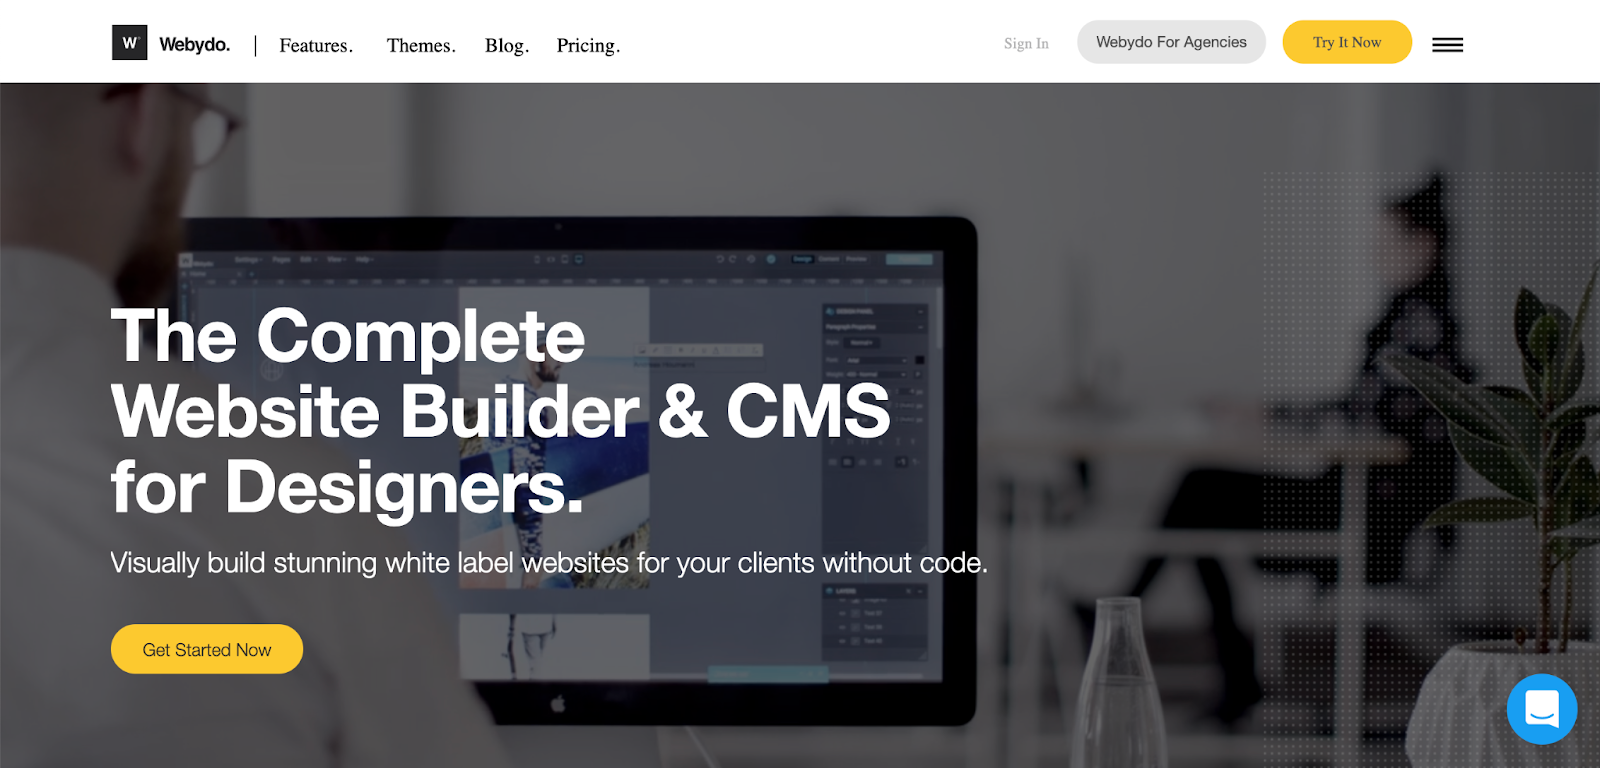 Webydo uses Helvetica bold as a modern headline – source